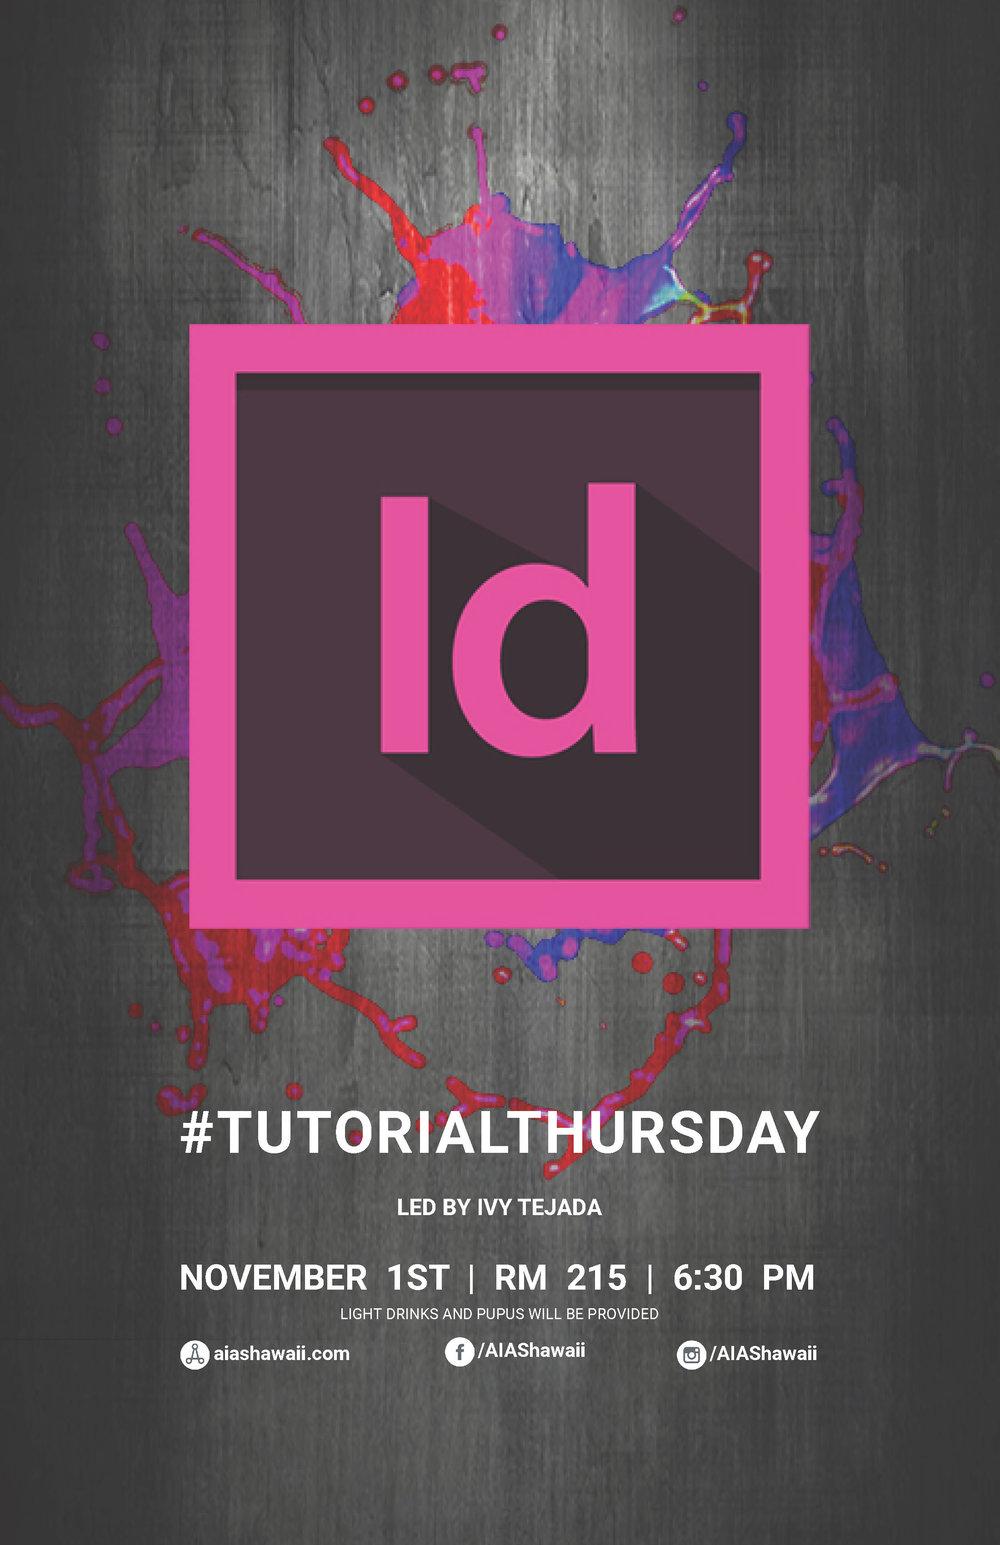 AIAS-2018 tutorial thursday poster.jpg